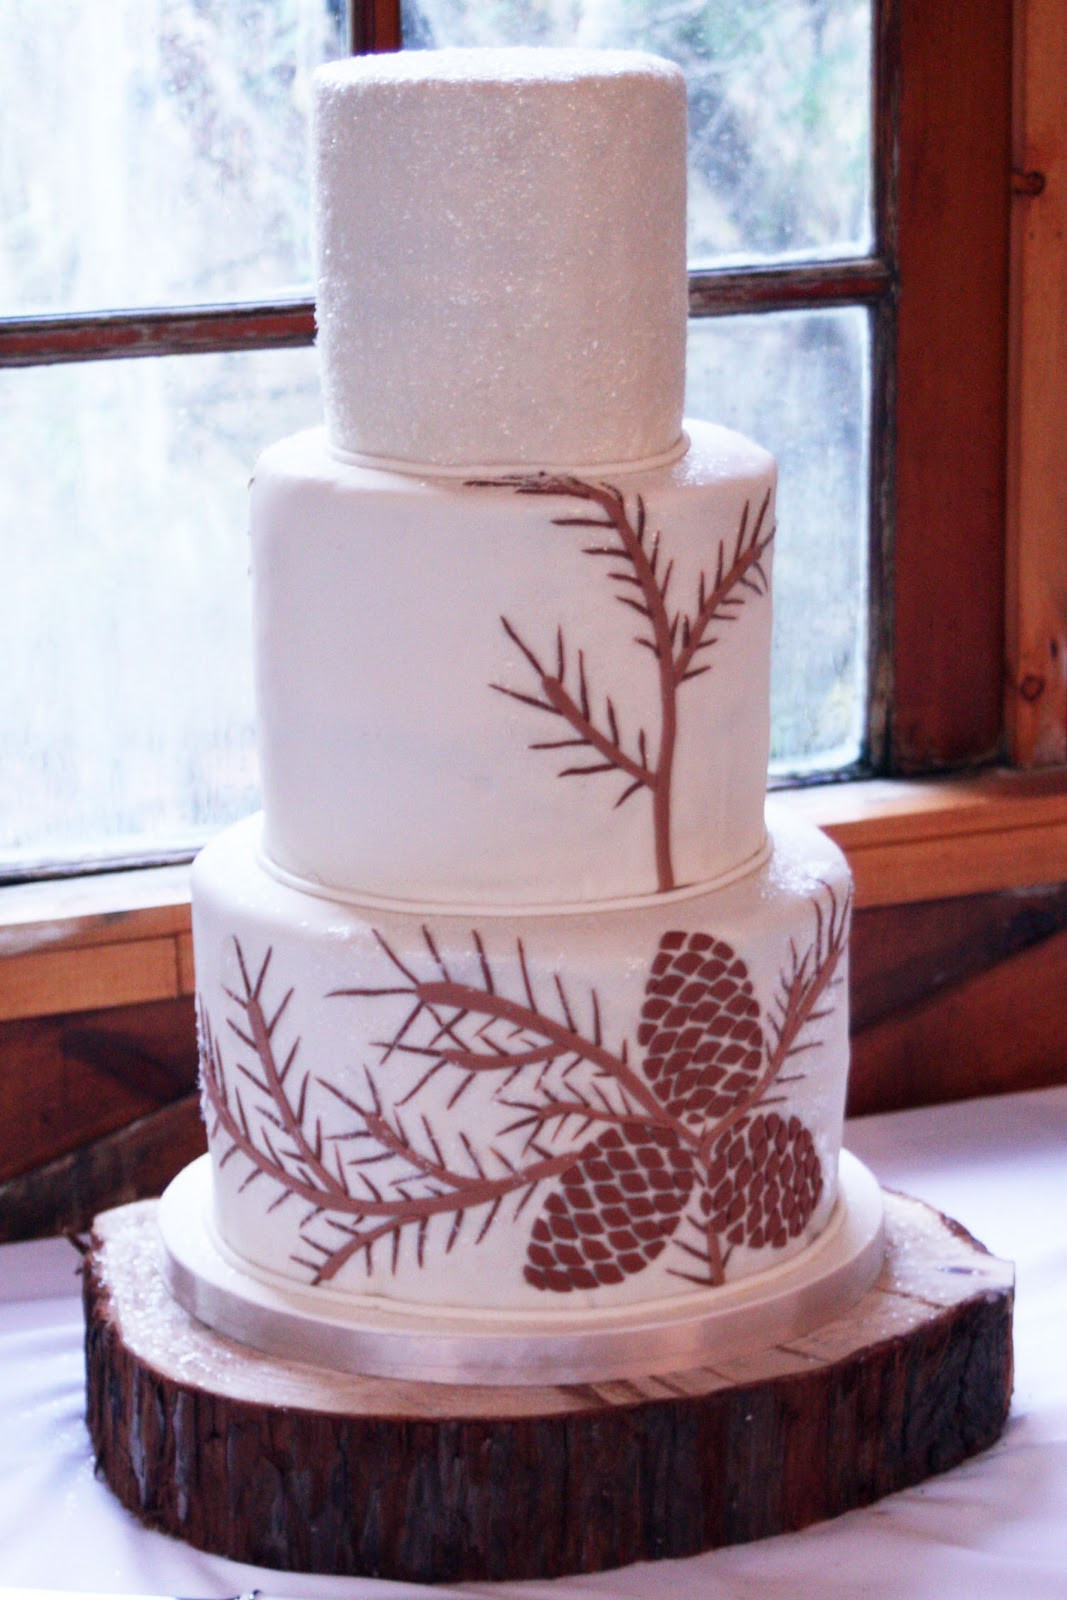 Pine Cone Wedding Cakes  Pastries By Vreeke Calamigos December Wedding